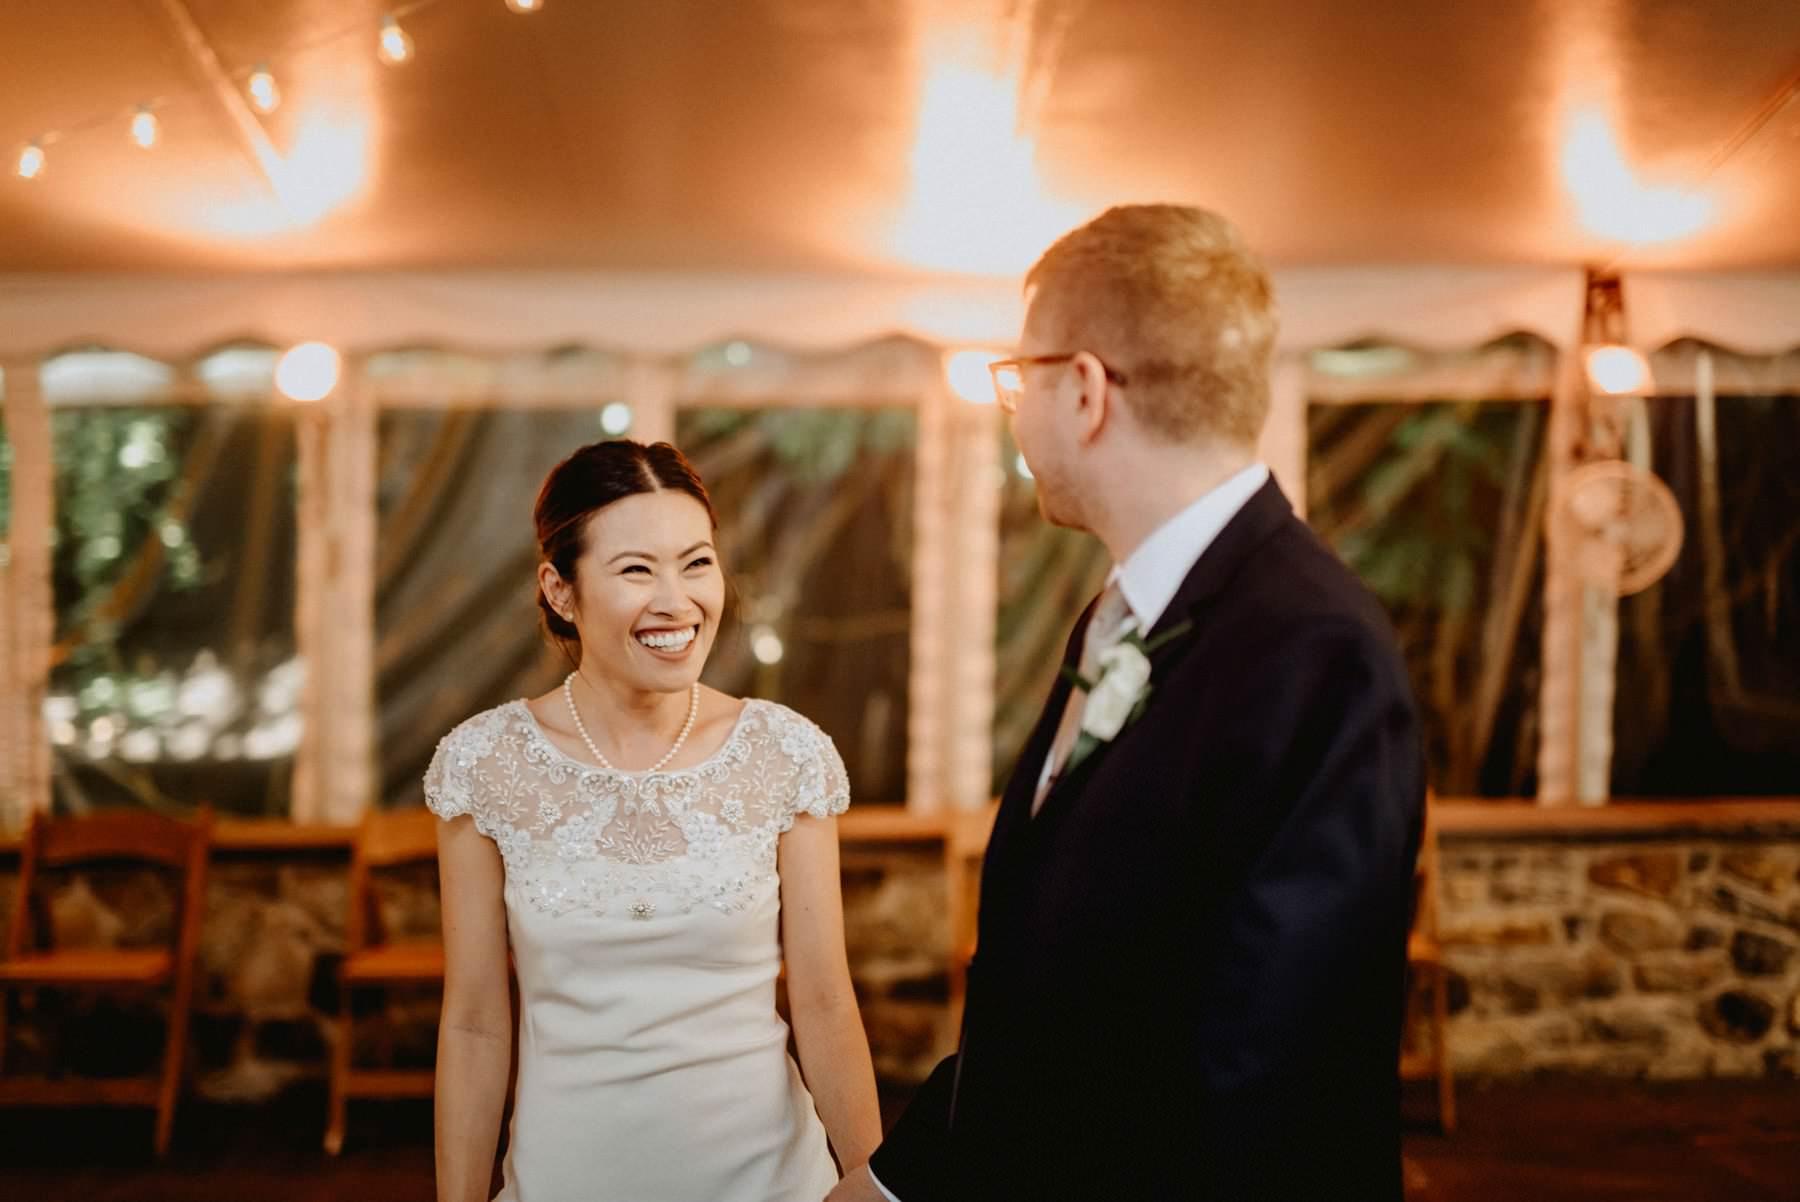 Appleford-estate-wedding-116.jpg